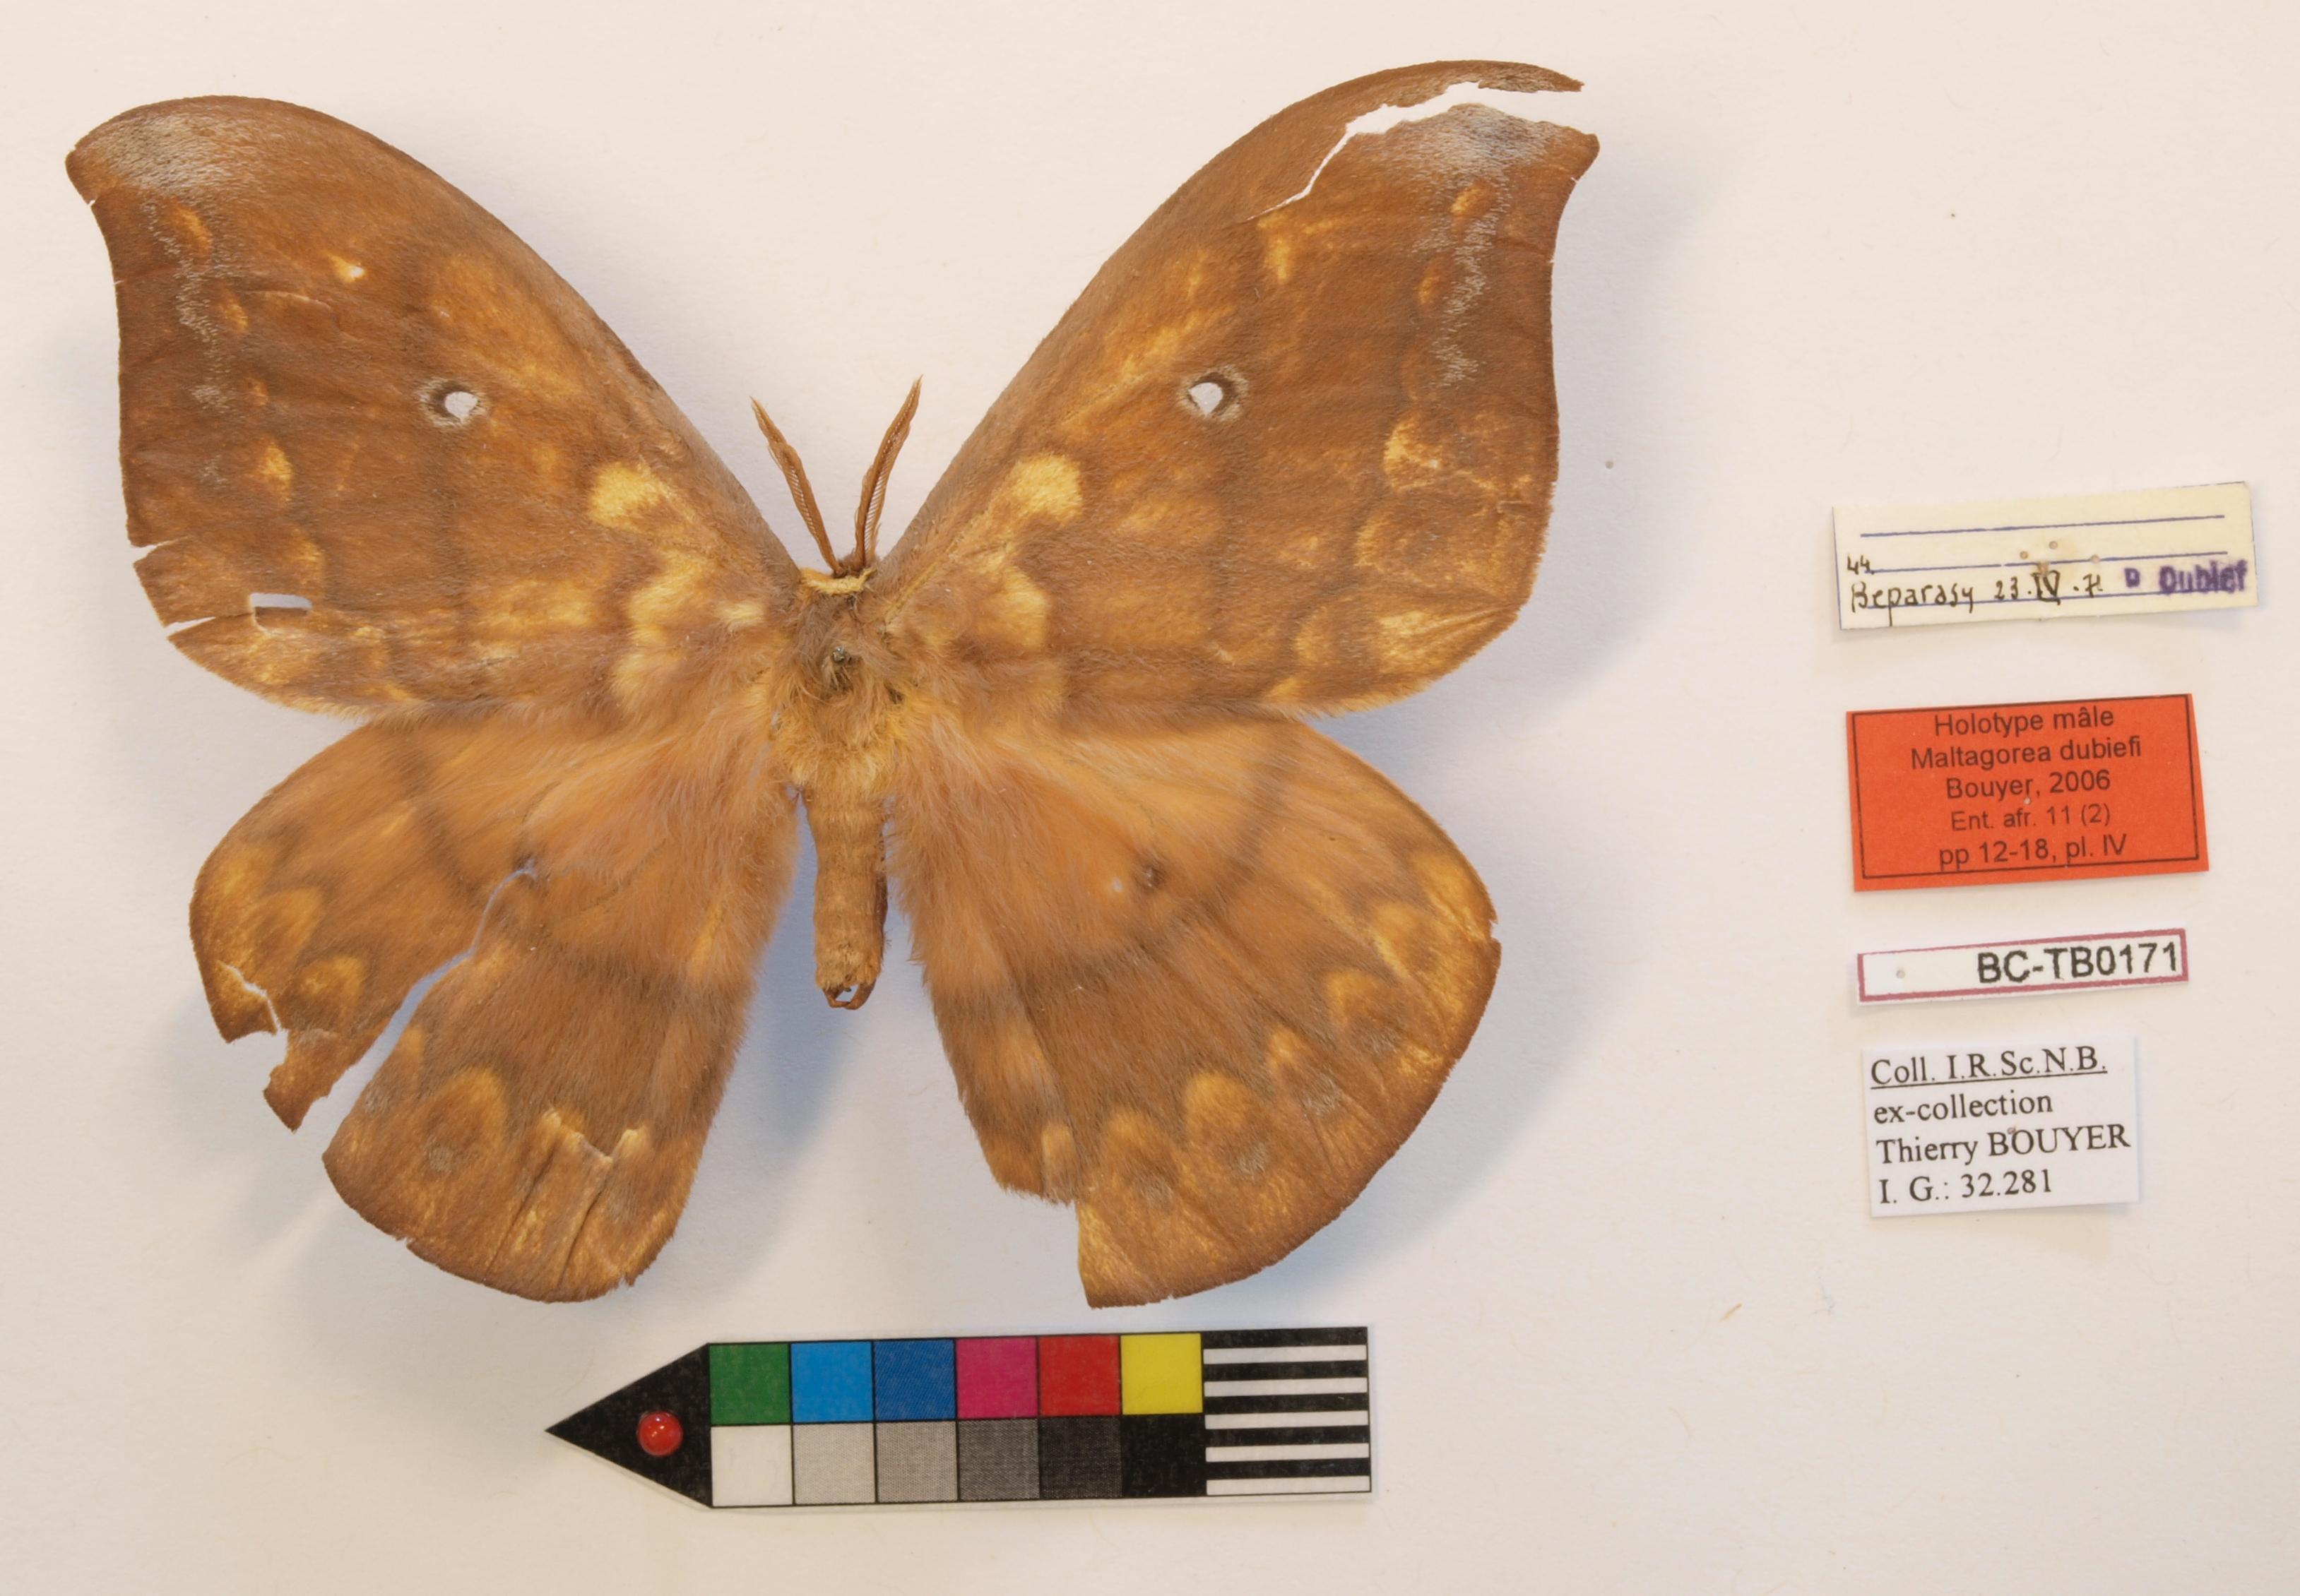 Maltagorea dubiefi M Labels Holotype.JPG